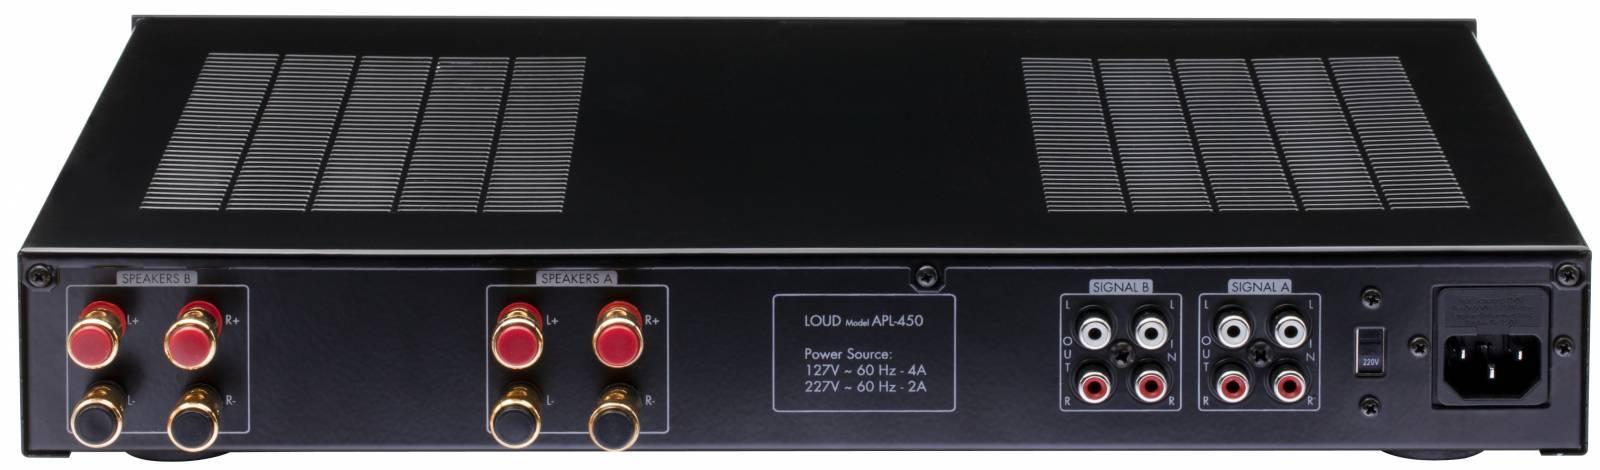 Amplificador Multi-room c/ controle de volume APL-450  LOUD - Ilha Suportes